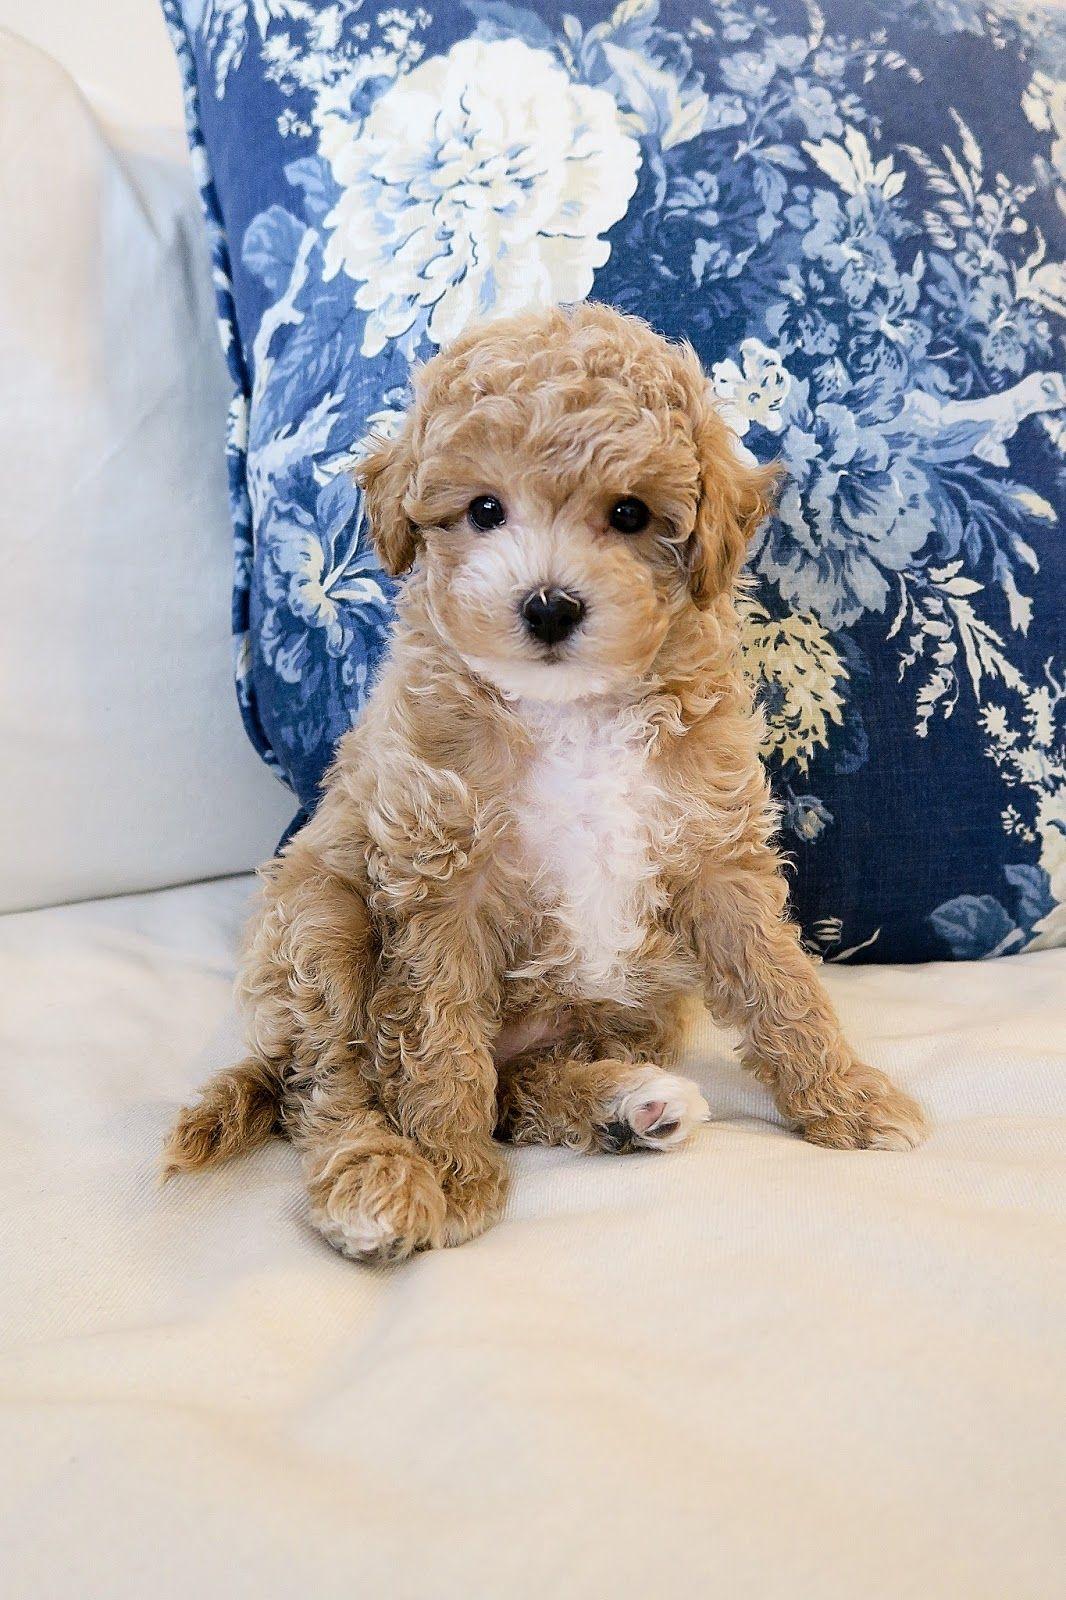 Our New Puppy Hamilton Cute Animals Puppies Dog Blog